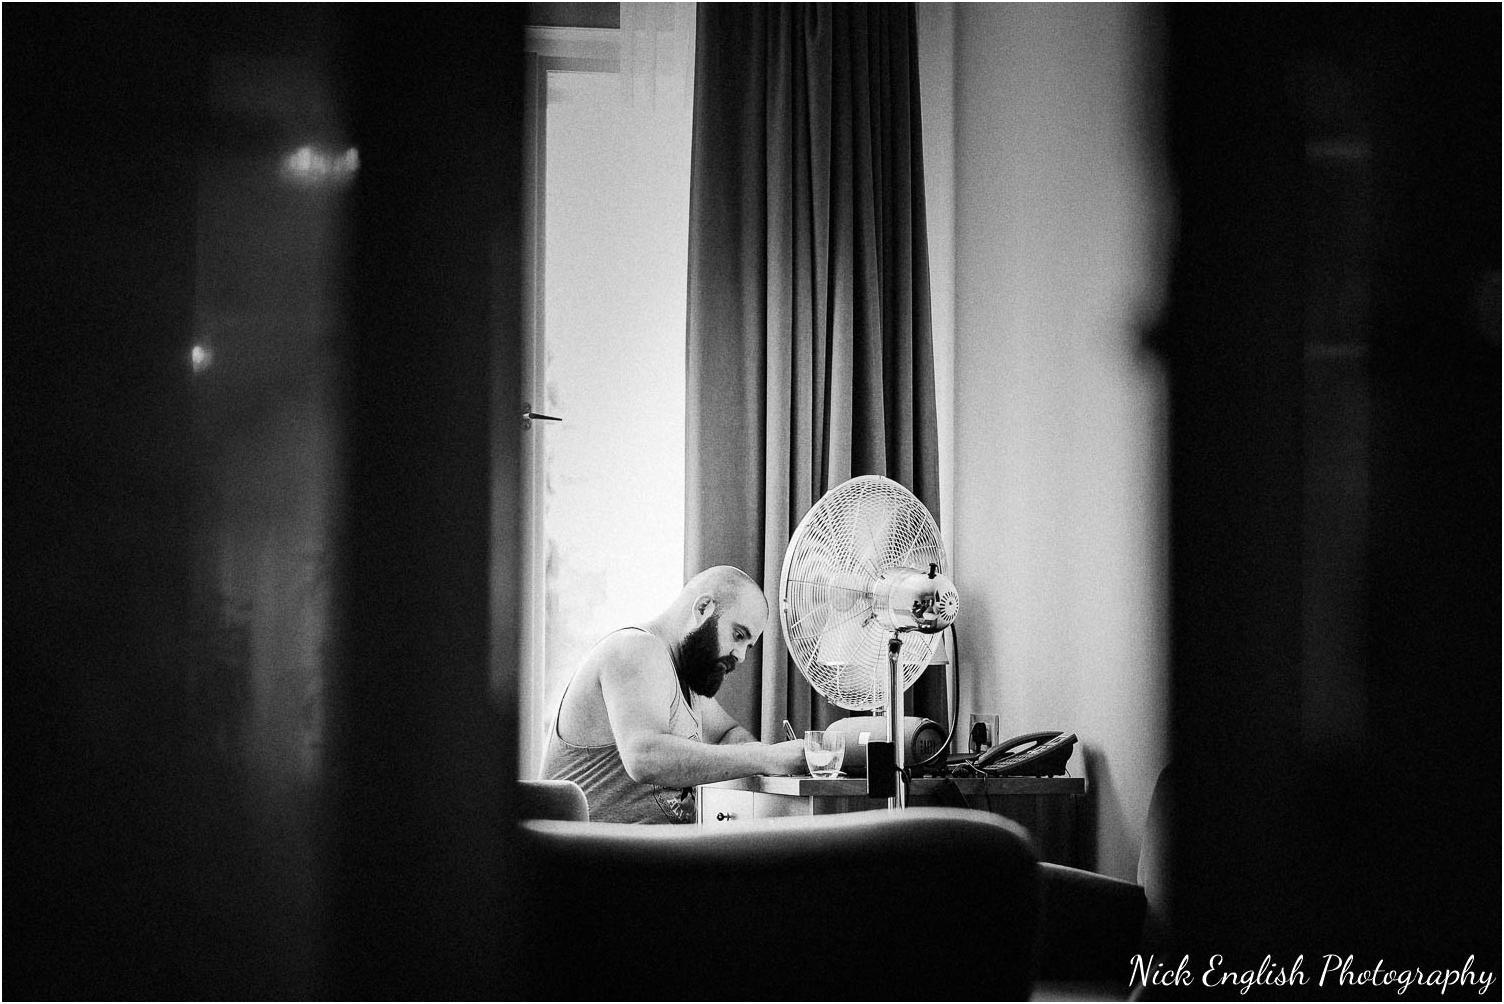 Destination_Wedding_Photographer_Slovenia_Nick_English_Photography-10.jpg